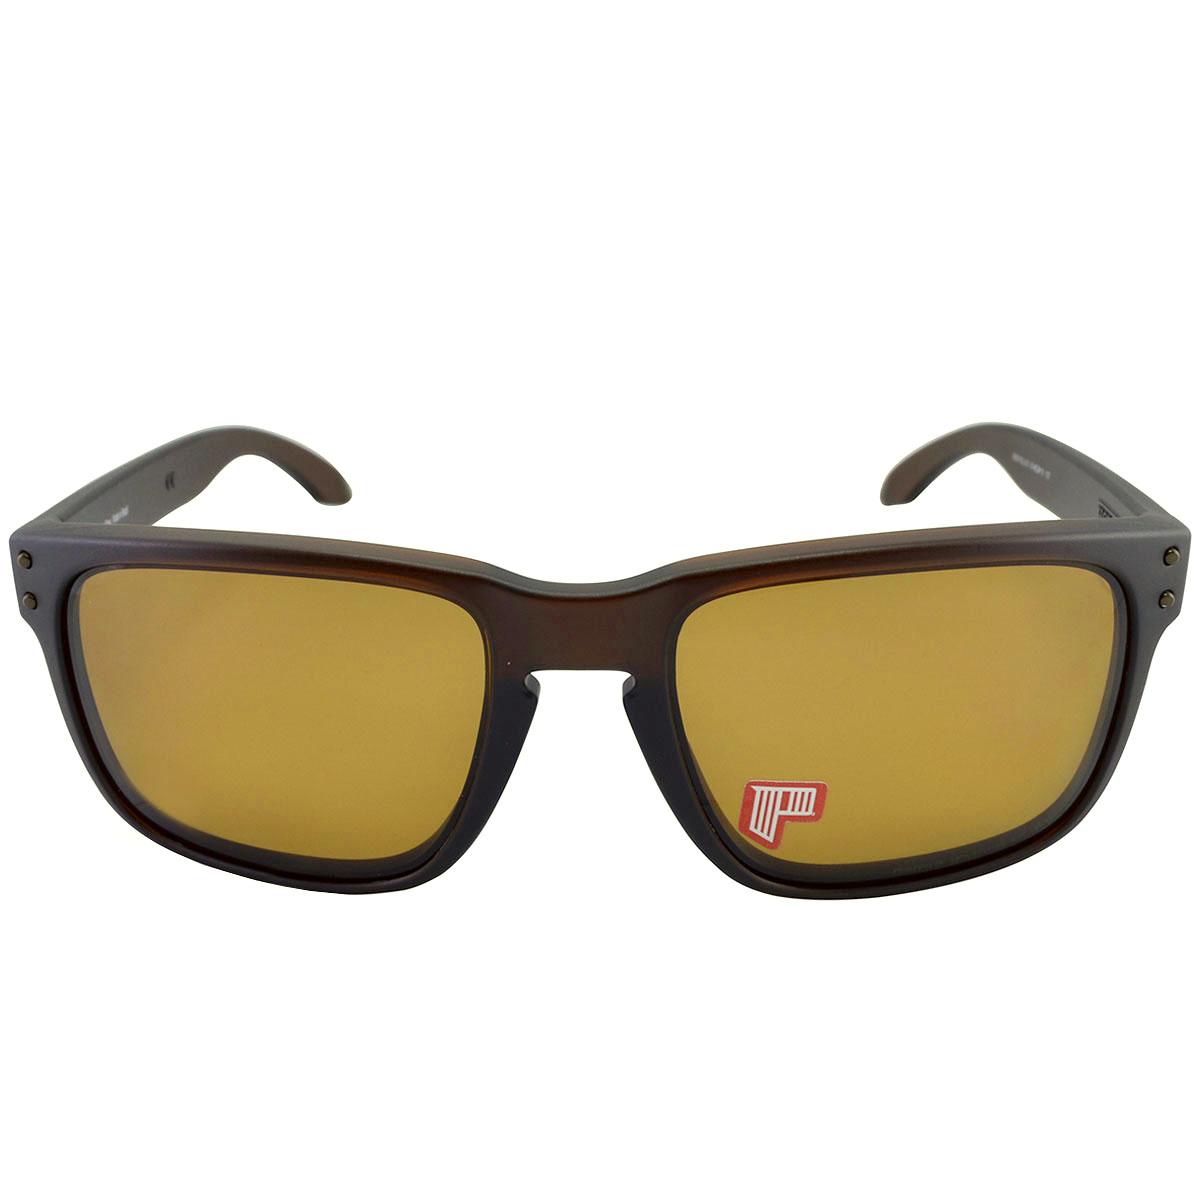 Óculos Oakley Holbrook Matte Rootbeer Lente Bronze Polarizado ref ... 6bb5e2801c